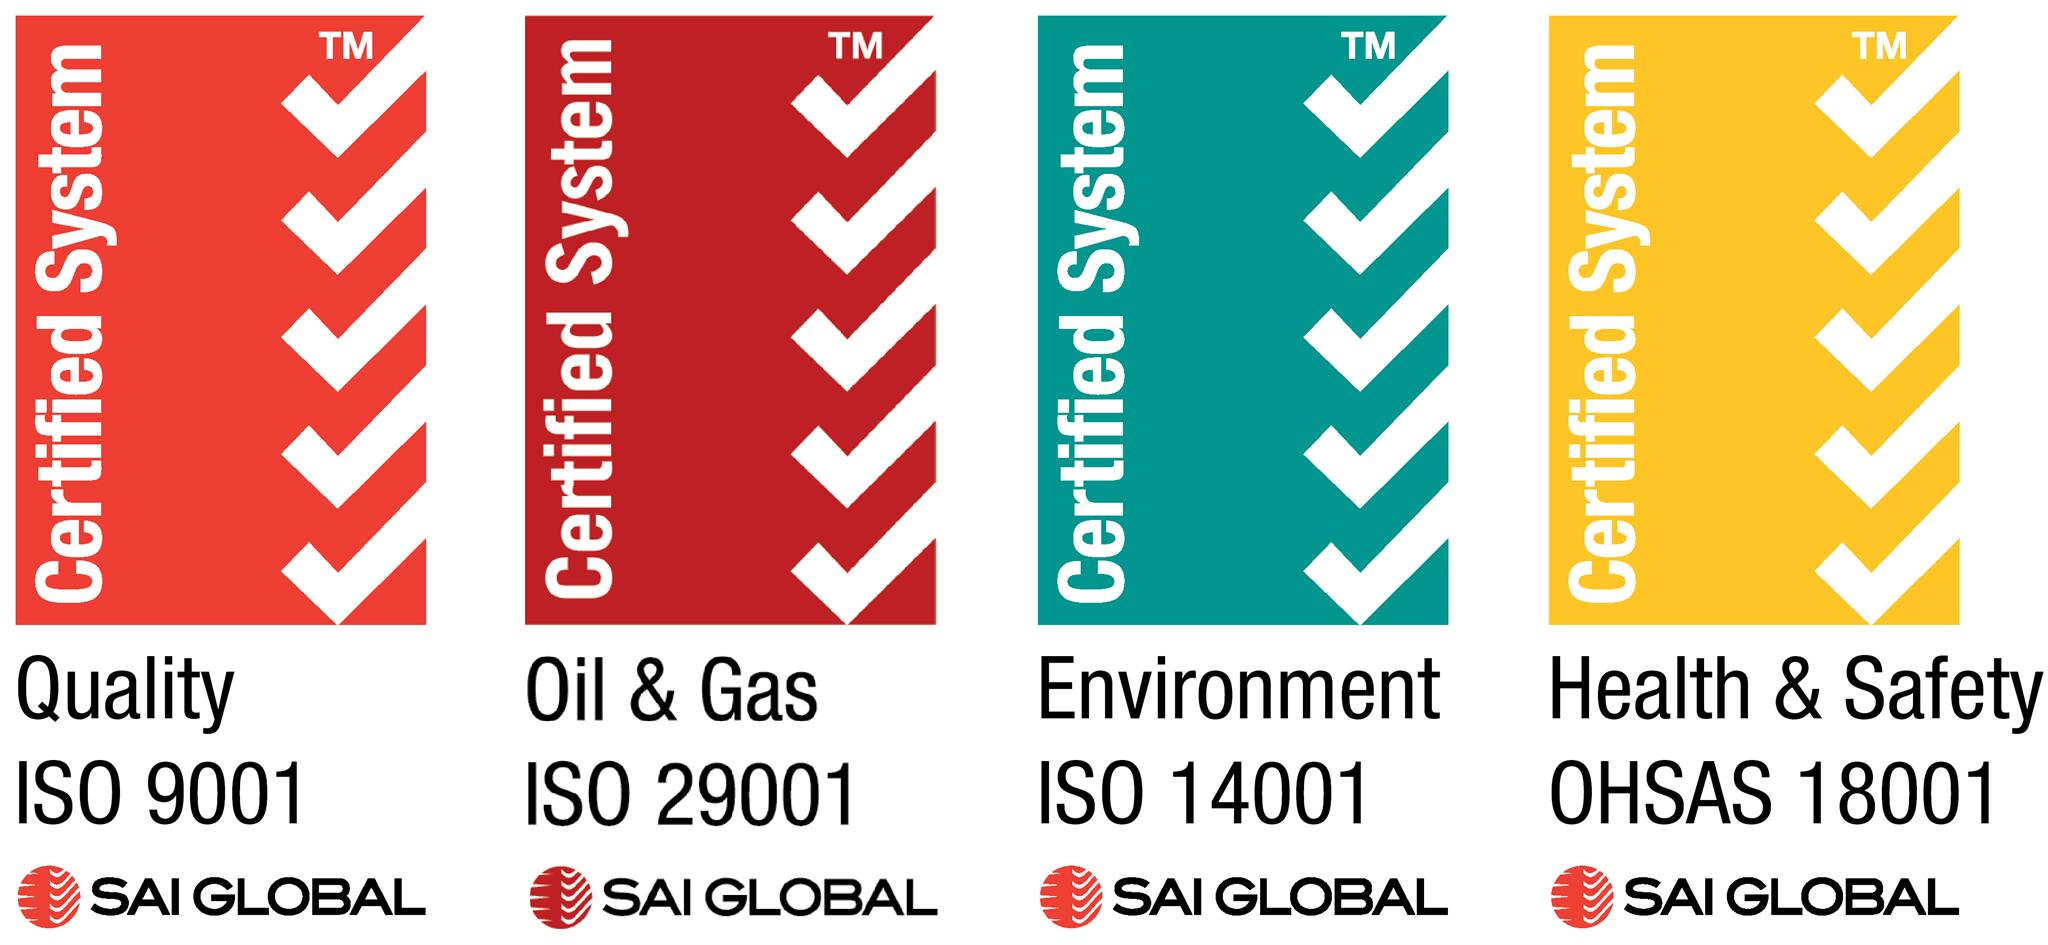 4 Quality logos- lower res.jpg